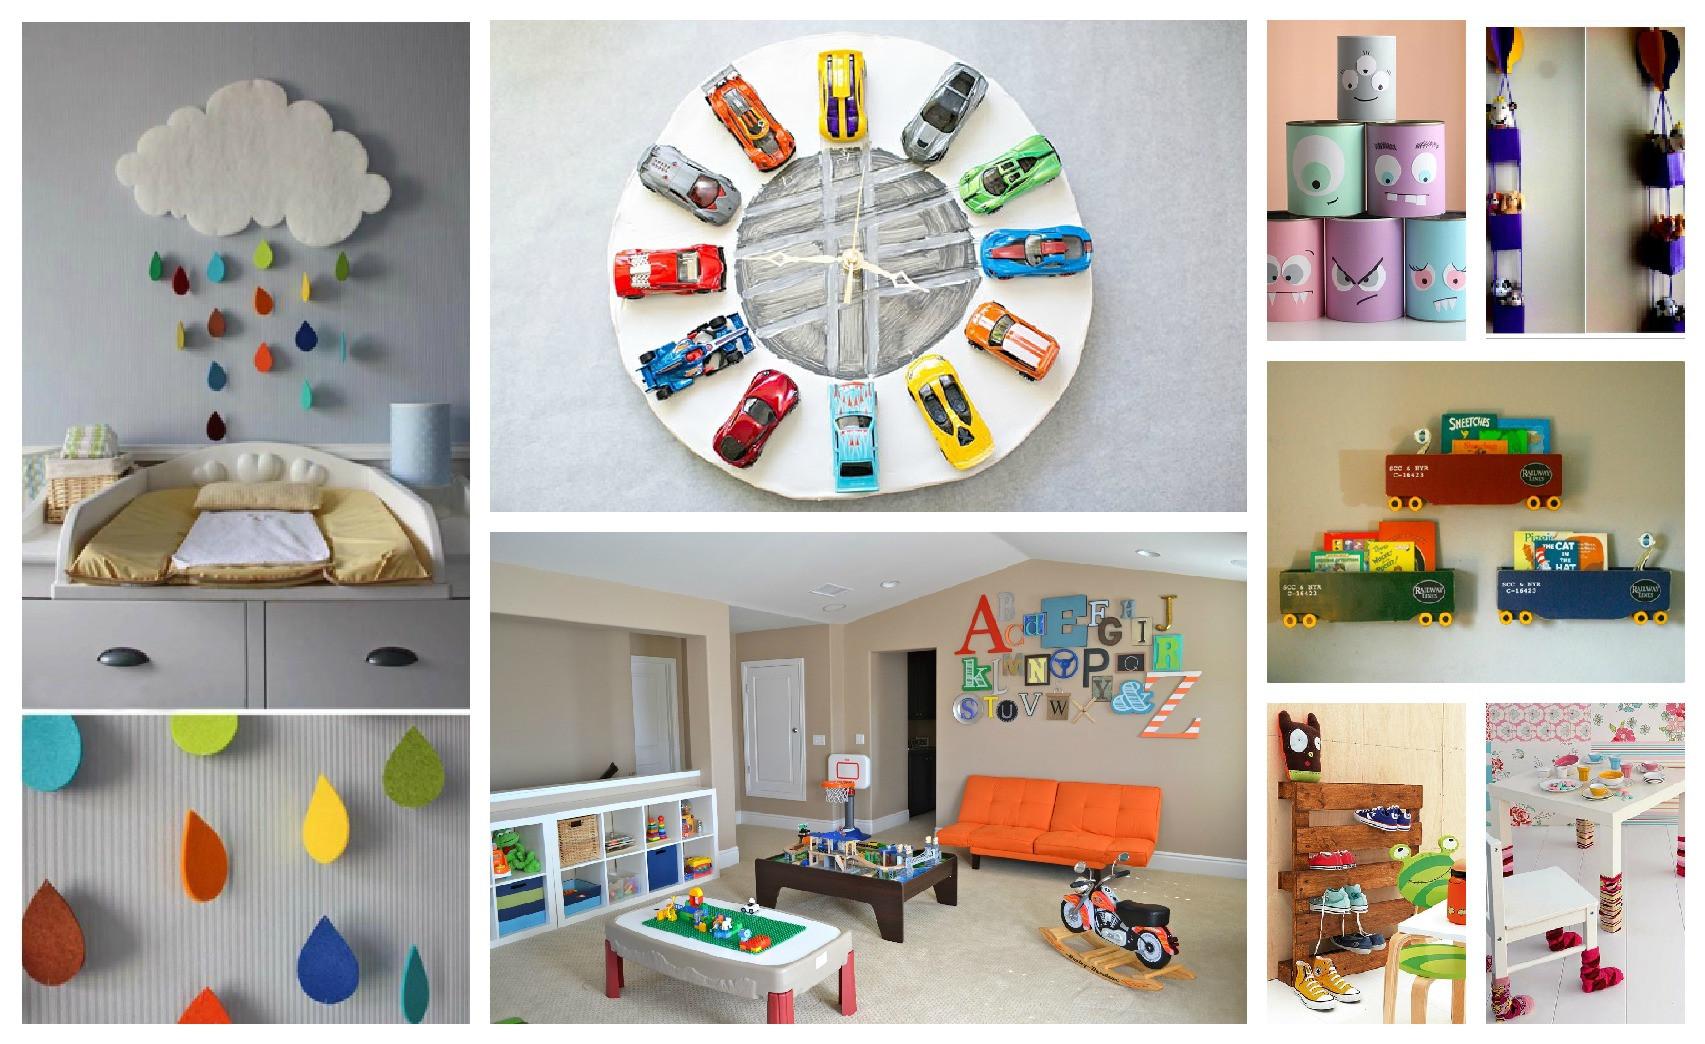 Best ideas about DIY Kids Room Decorations . Save or Pin DIY kids room decor ideas Archives Now.